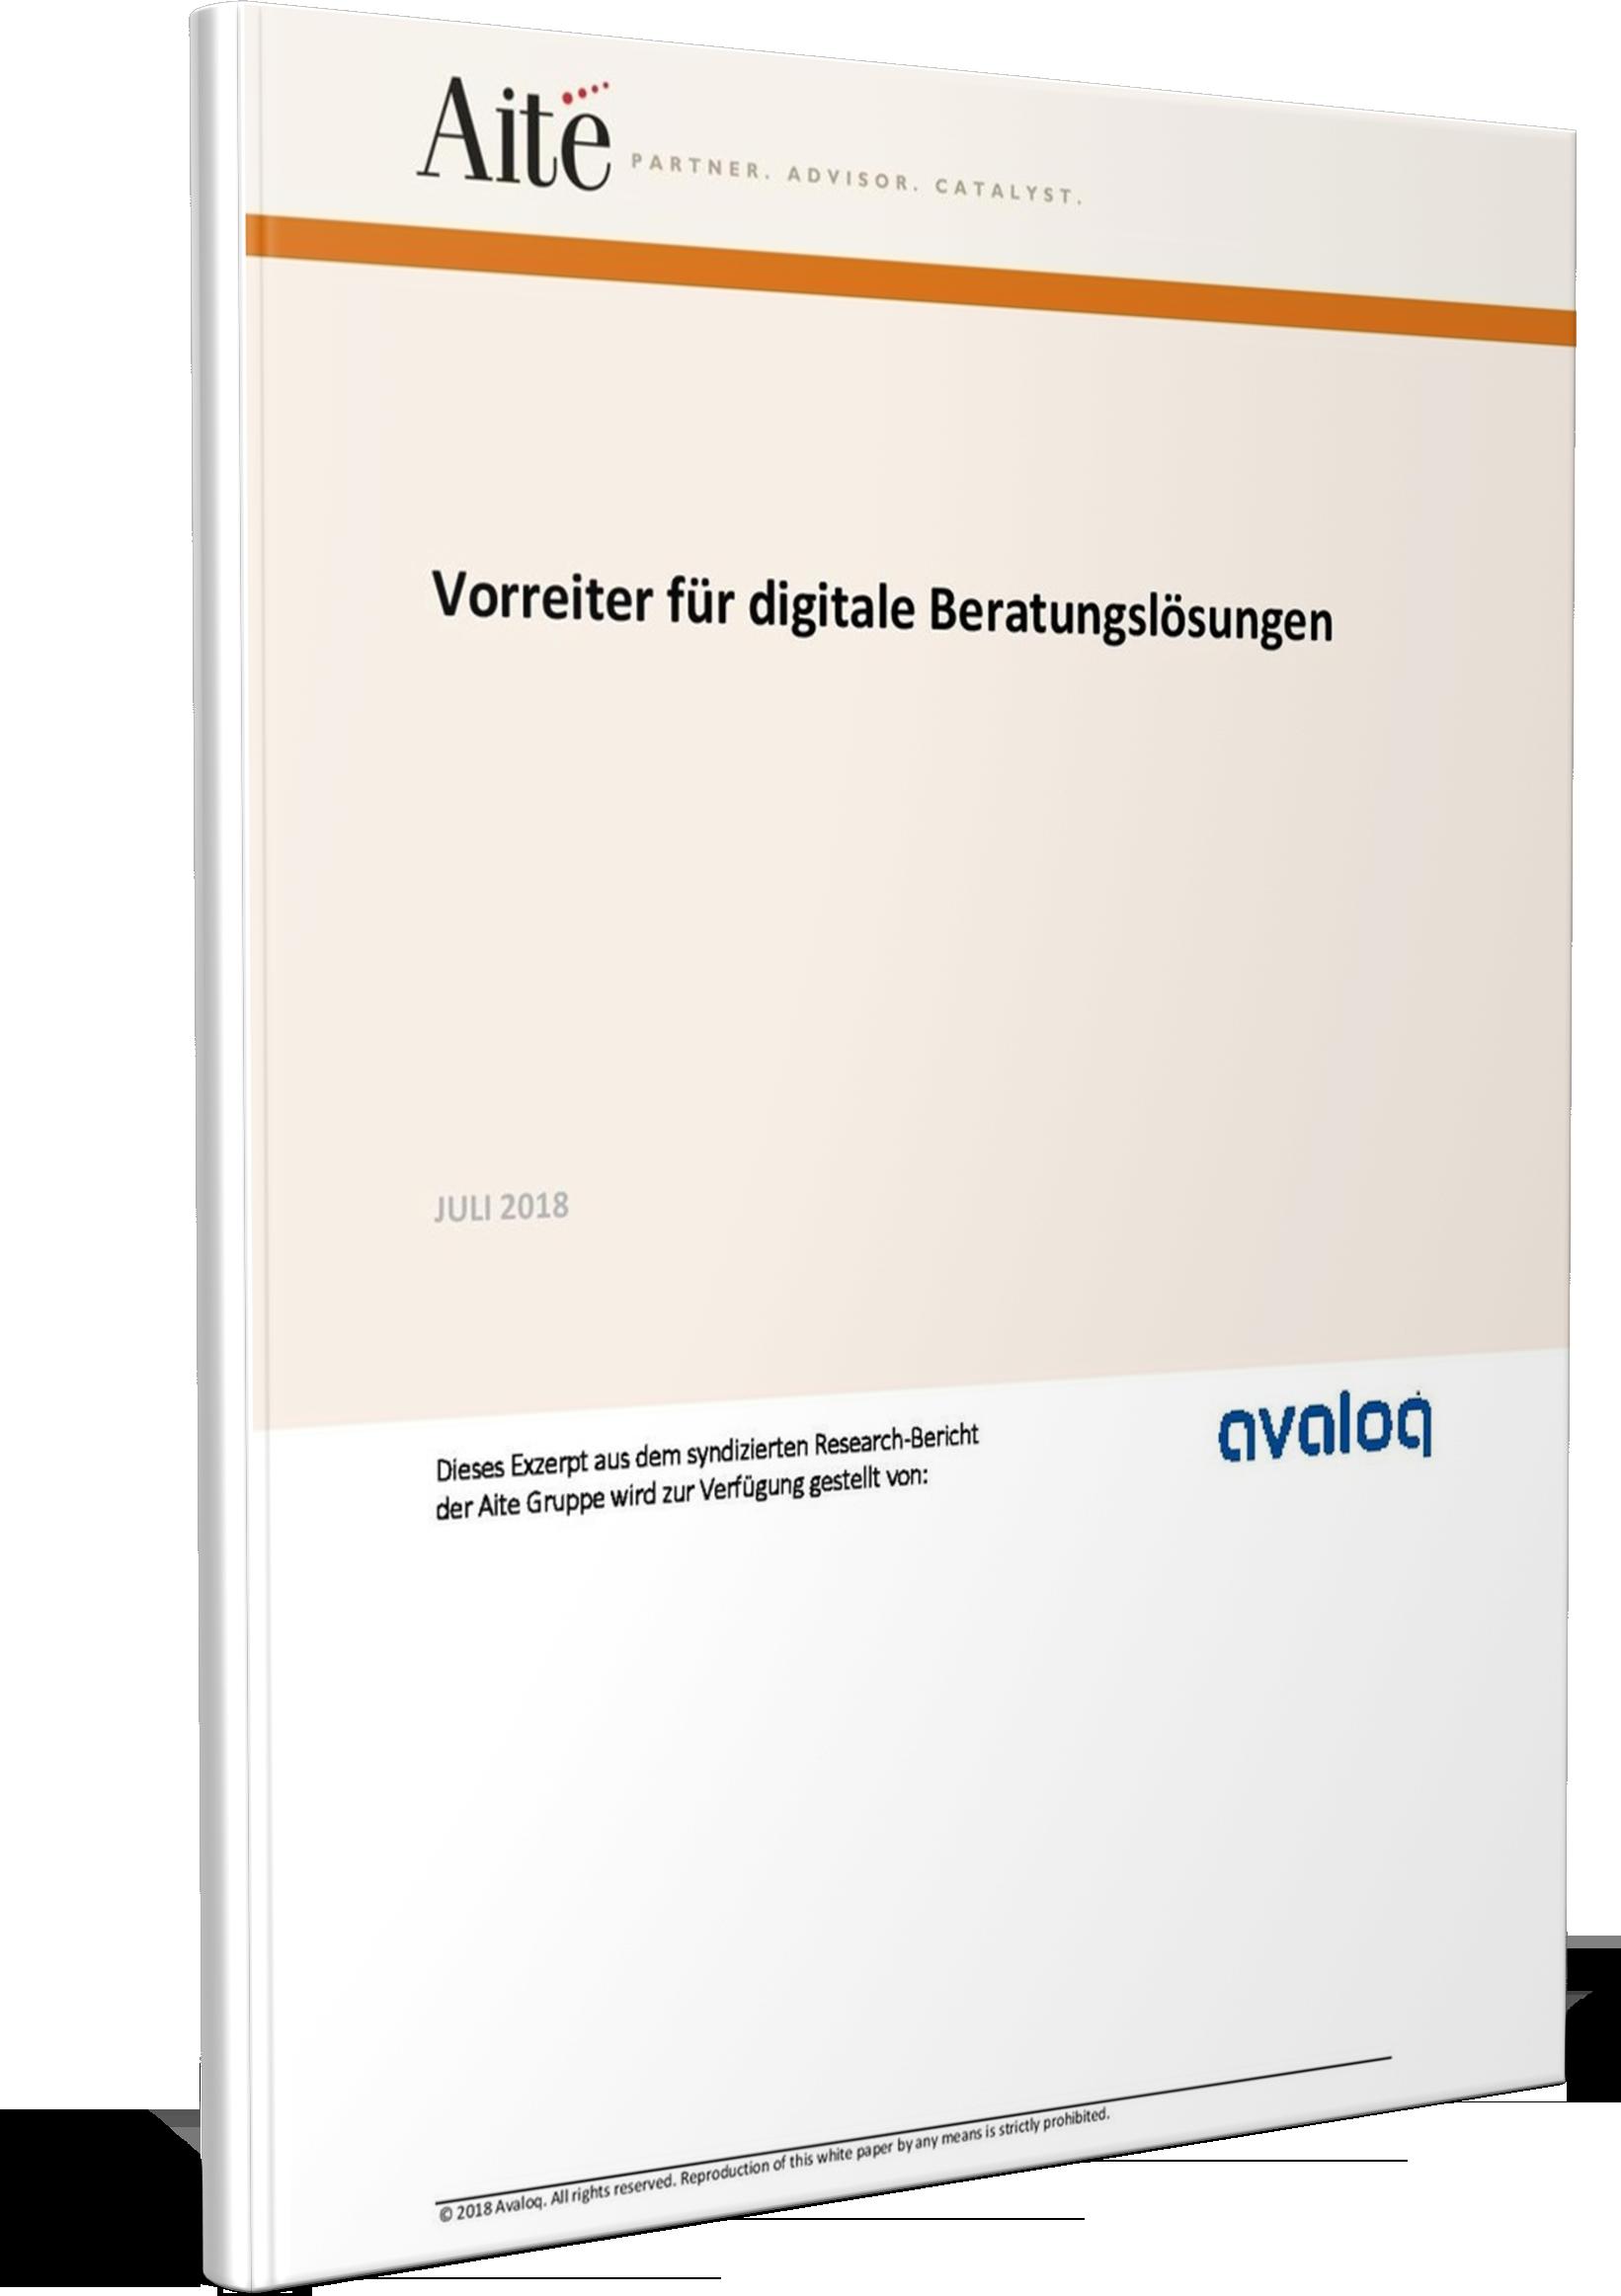 3D_Cover_Aite WP Vorreiter fuer digitale Beratungsloesungen_DE